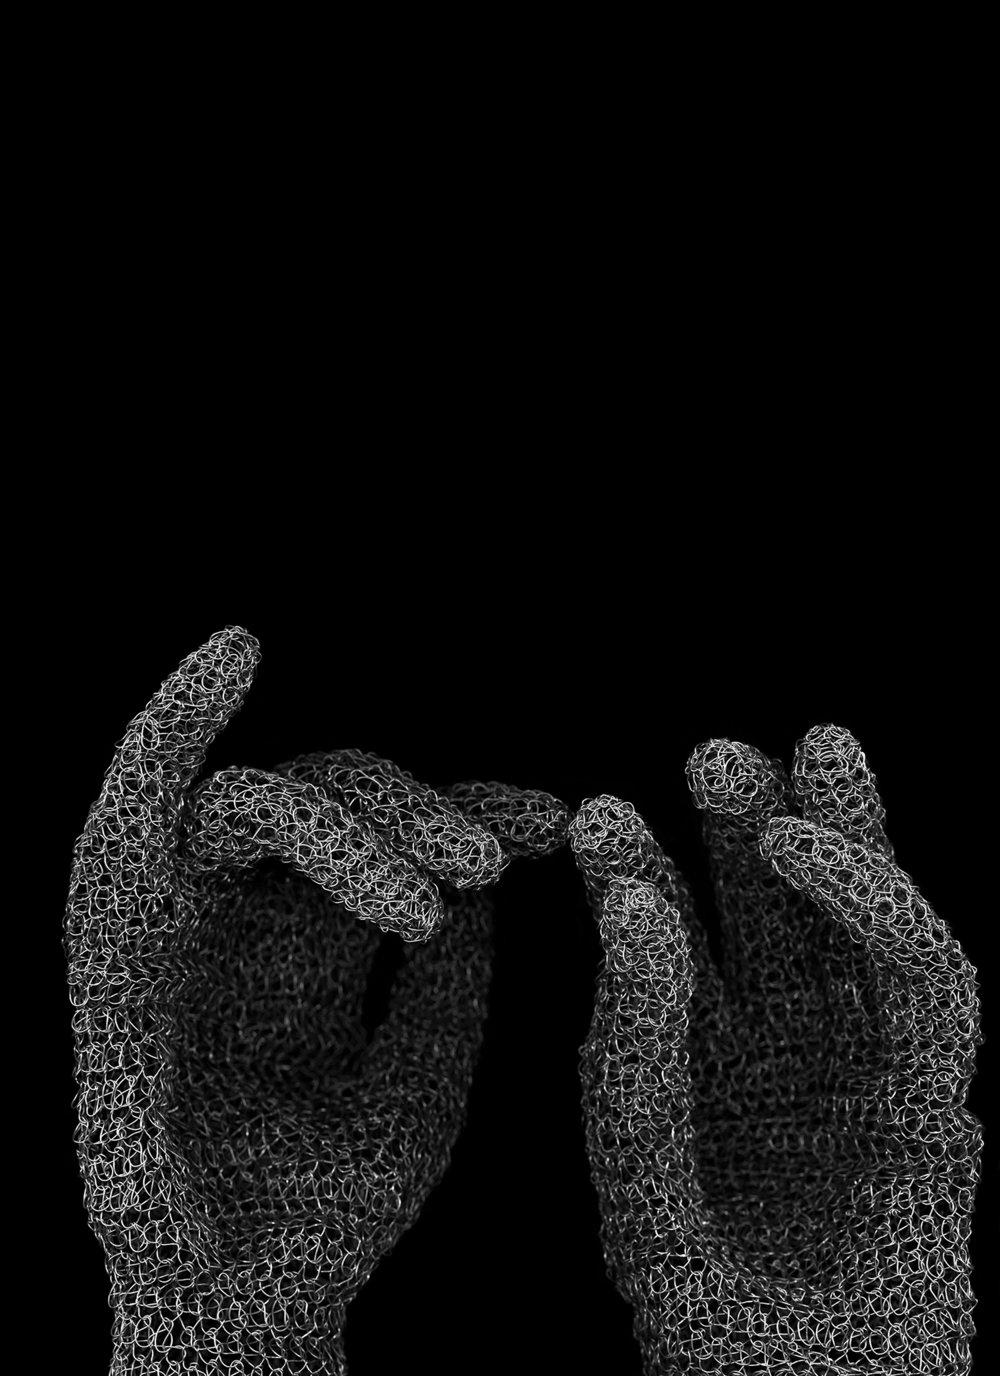 Ceres-Anne Mondro-_Sentient II_-9_x12_-digital print-2013-$700.00.jpg